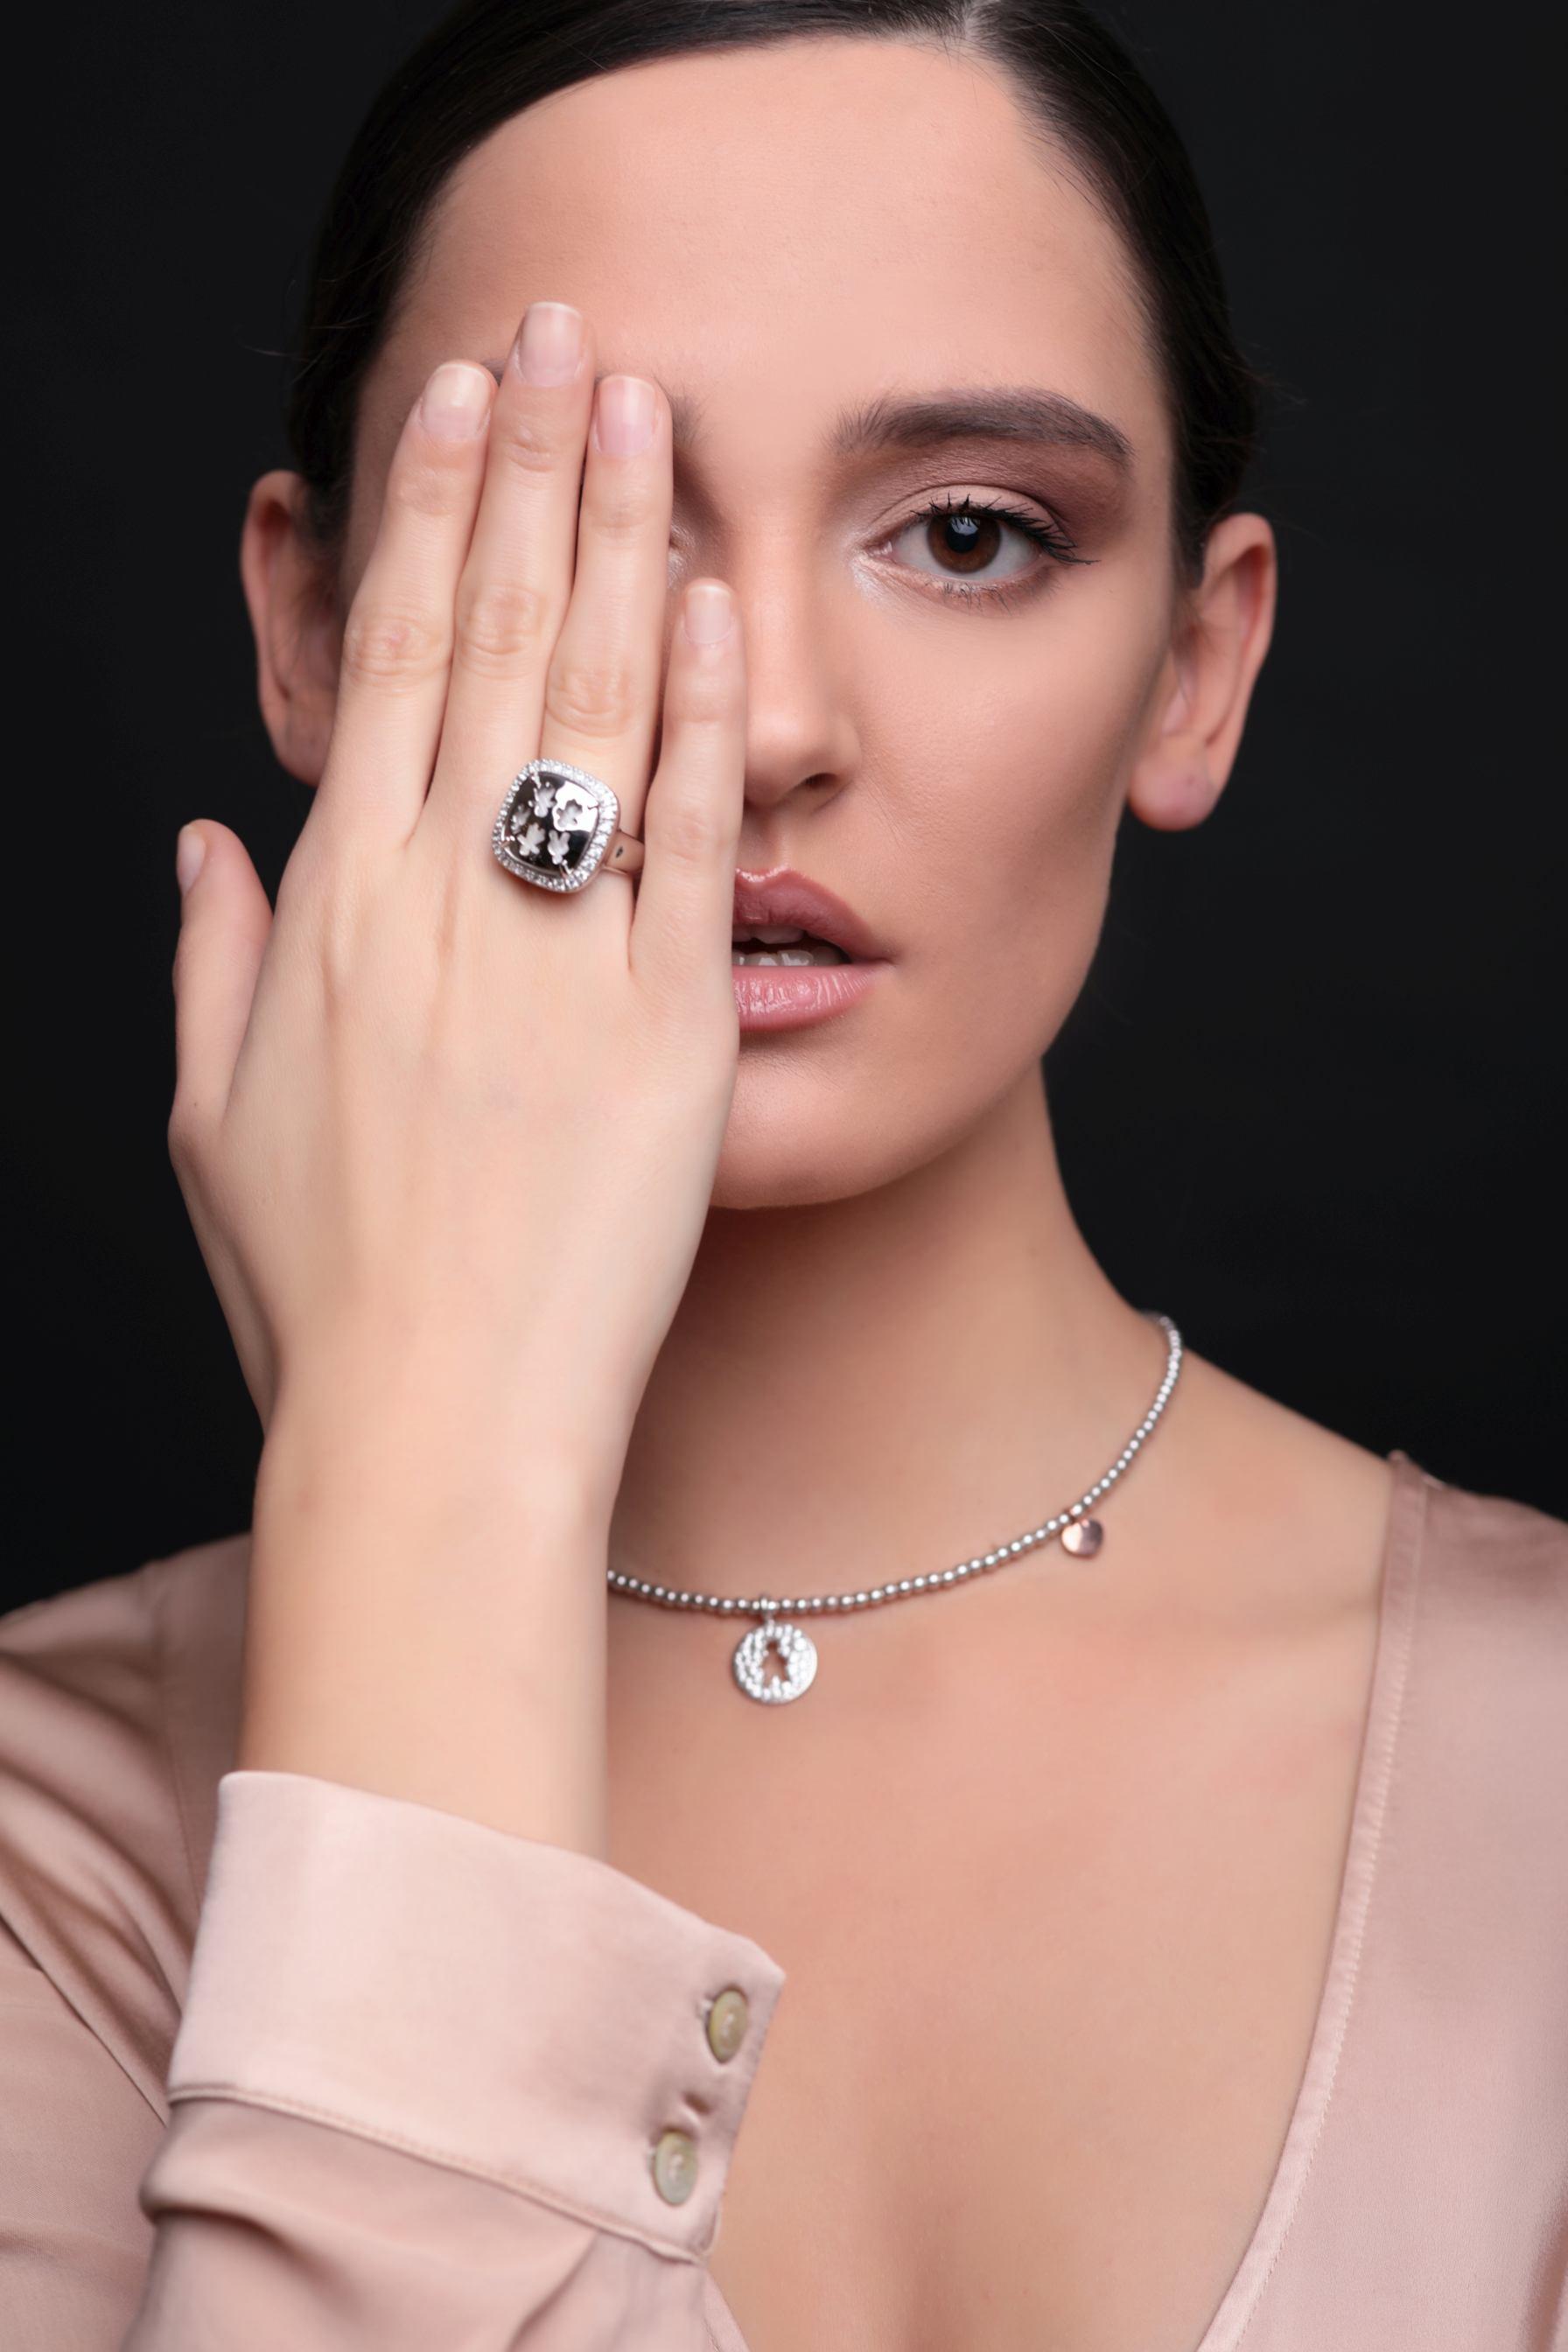 Srebrni prsten, redovna cijena 990kn, s popustom 495kn, srebrna ogrlica, redovna cijena 1090kn, s popustom 545kn, Zaks